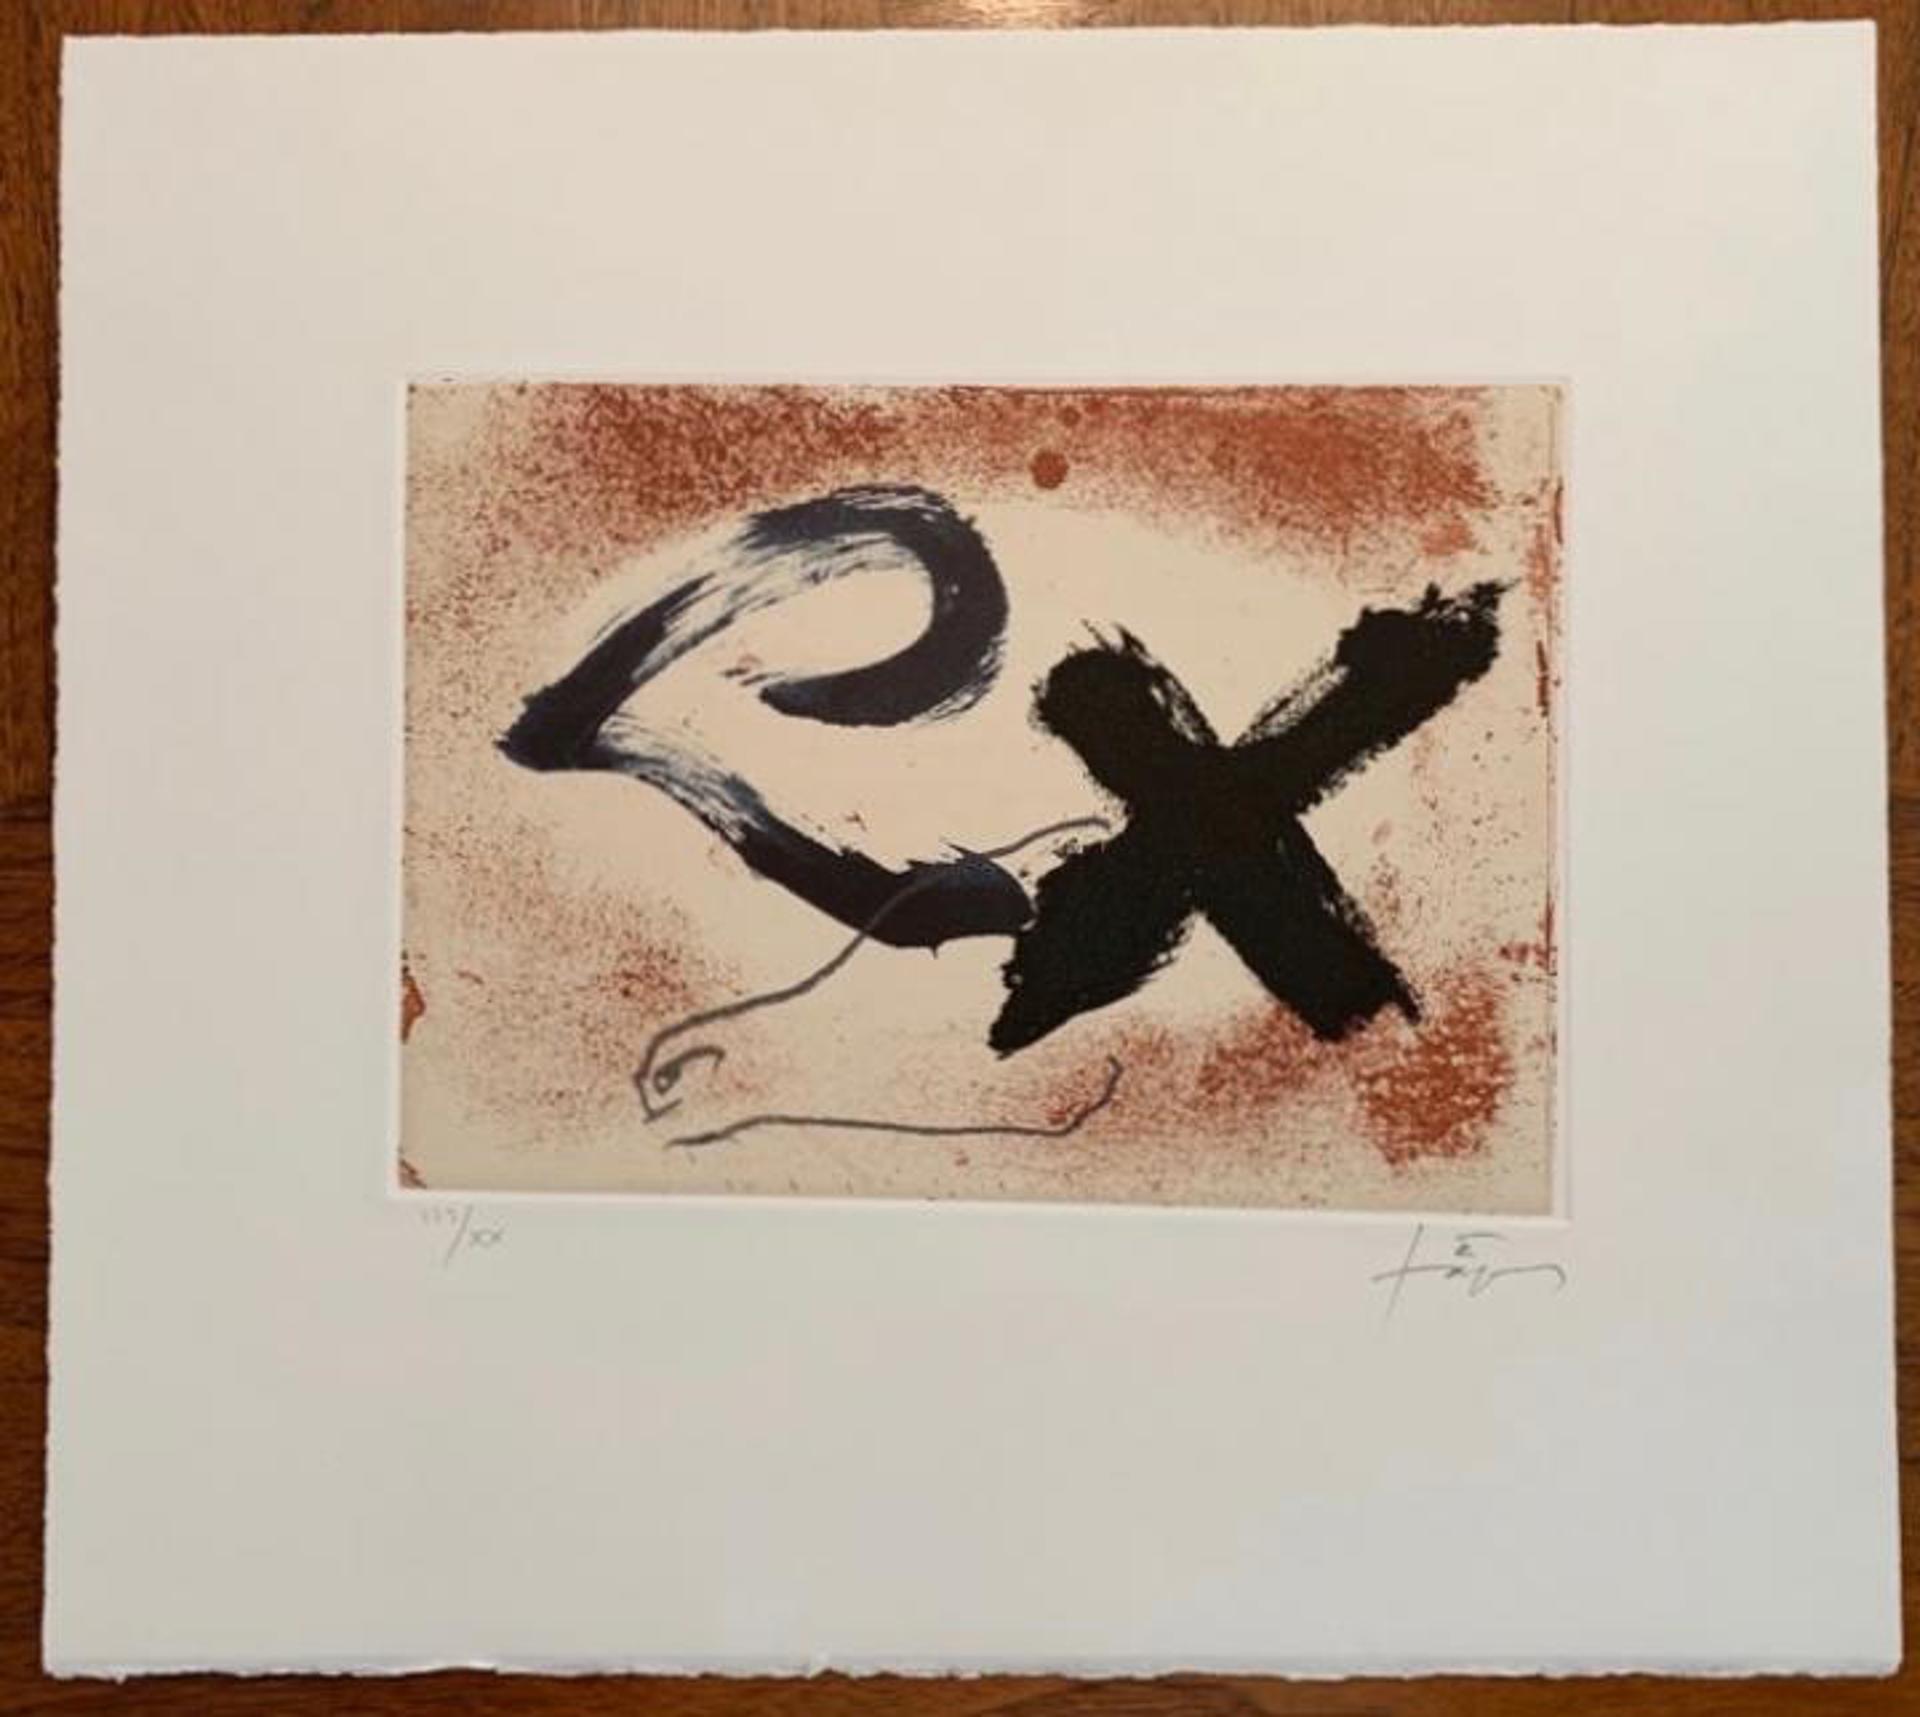 Signes i oxid by Antoni Tapies